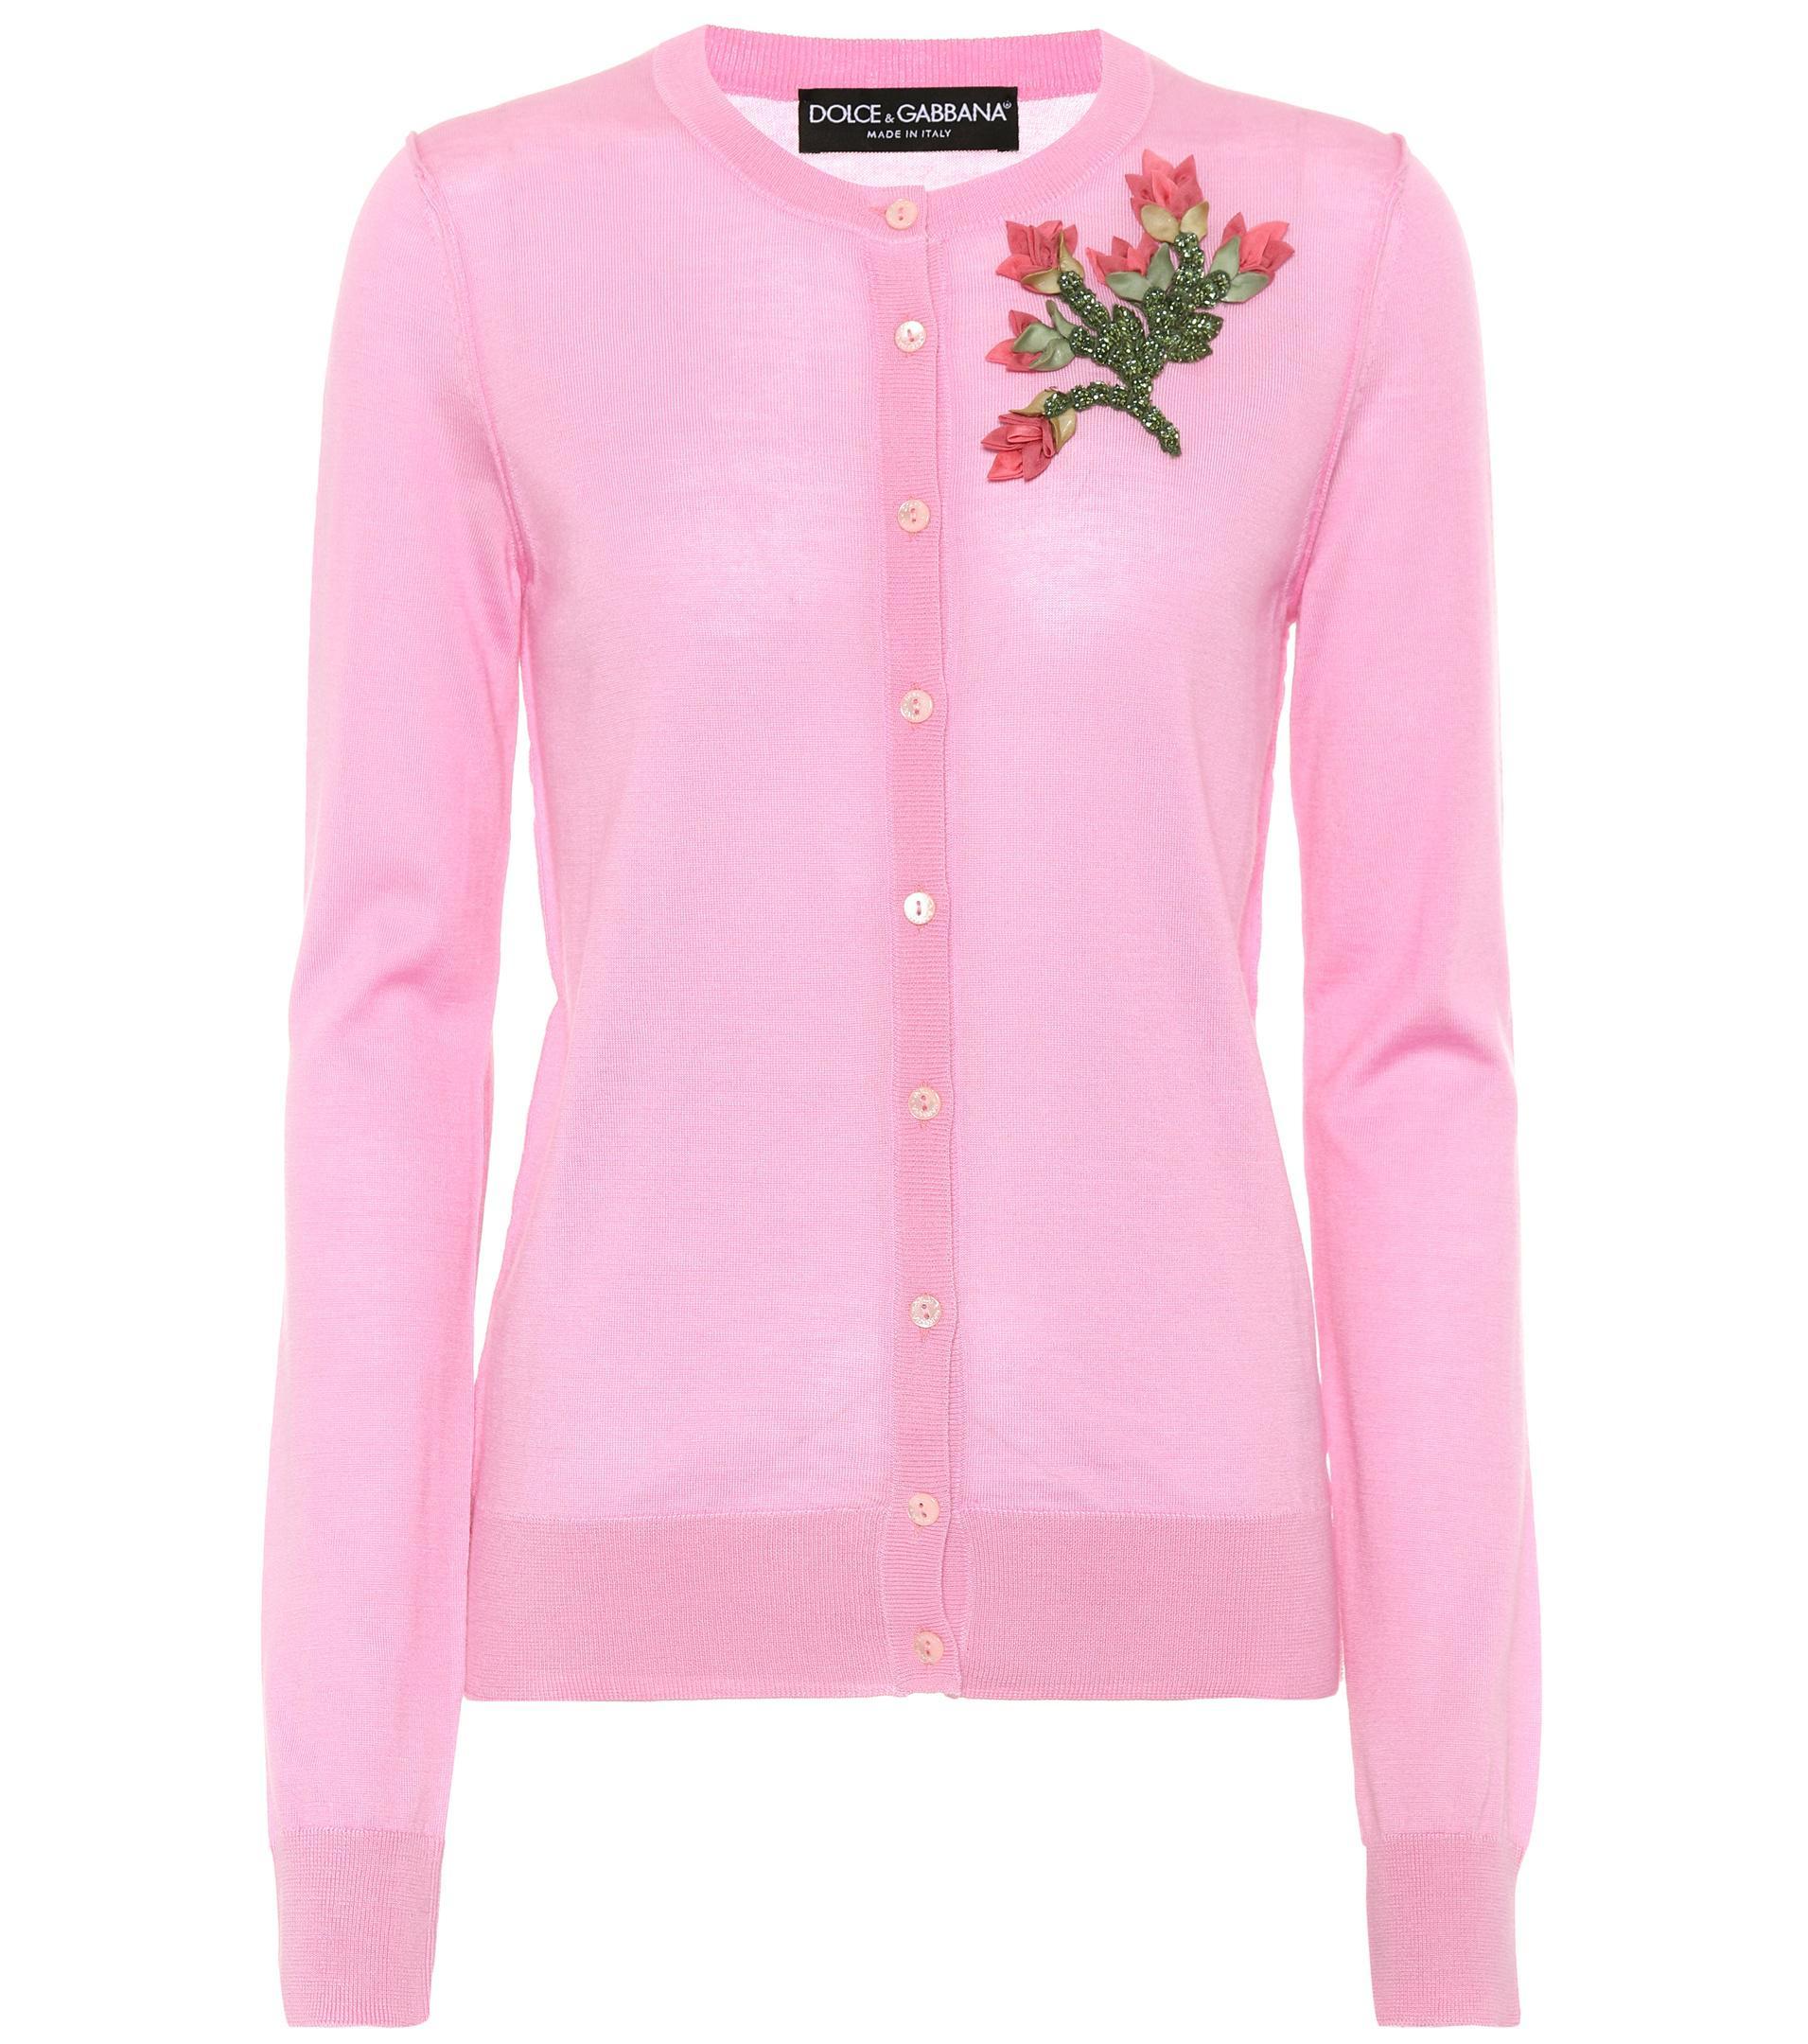 Dolce & Gabbana Cashmere Longline Cardigan Discount Best Store To Get 382JsVl4PM